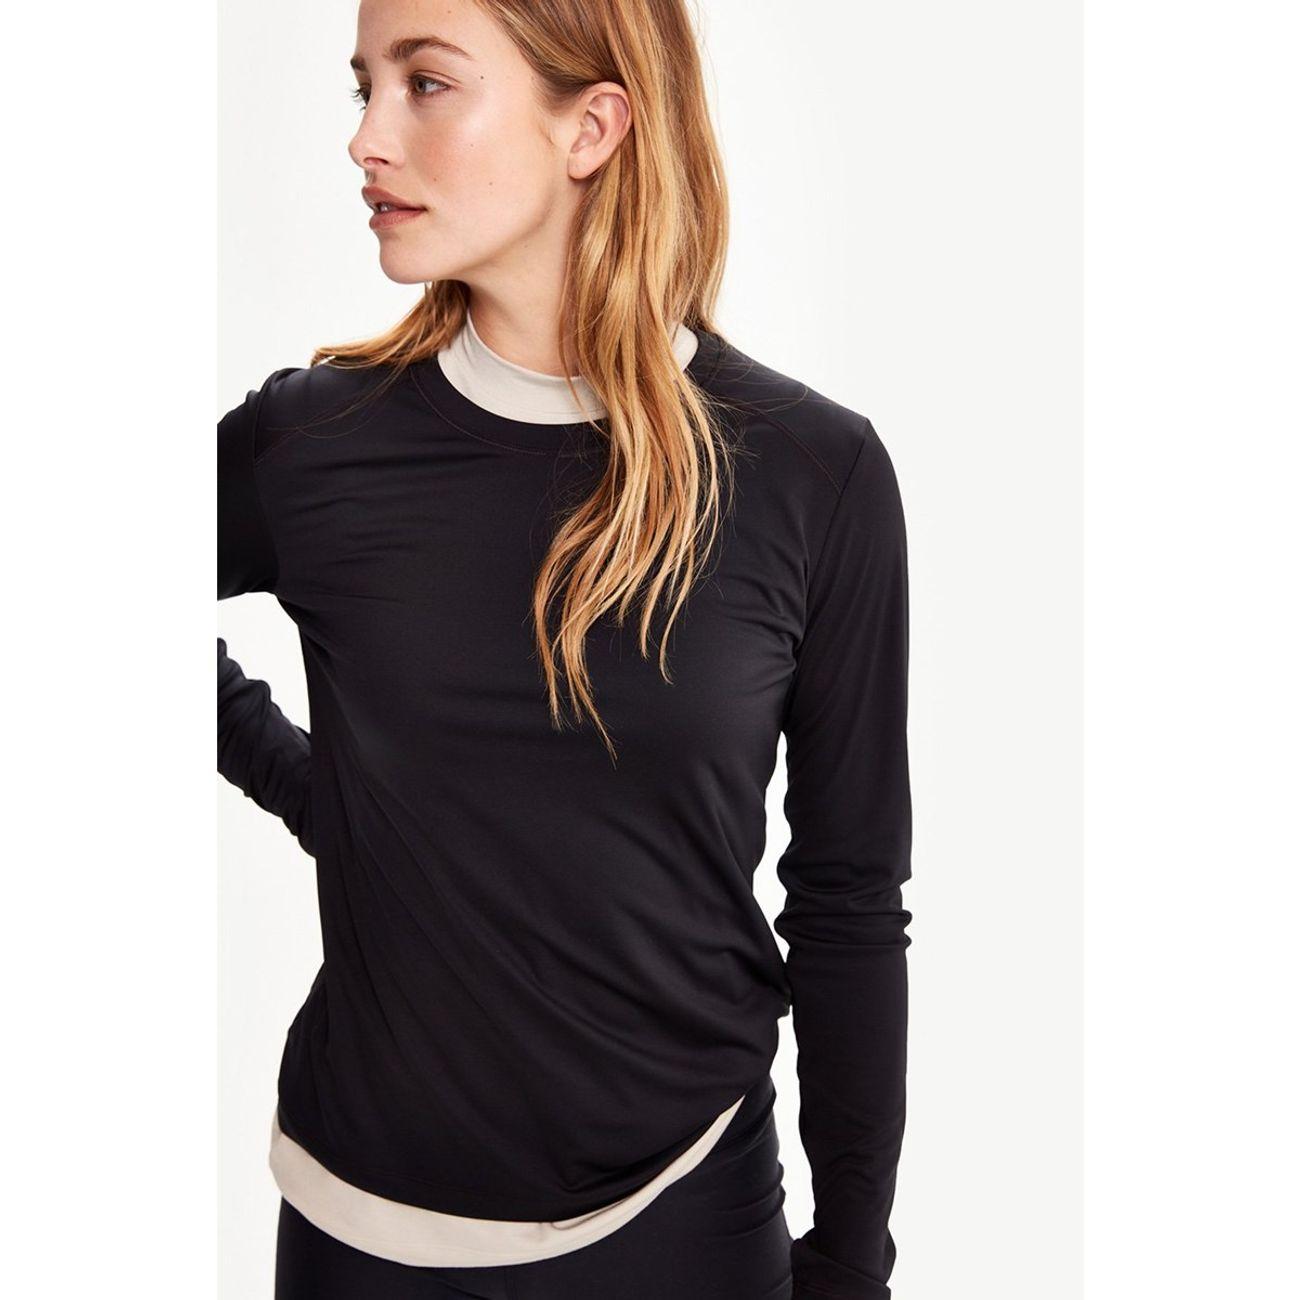 T Yoga shirt Anti Cardio Lole Manches Femme humidité Longues OZuXkiTP